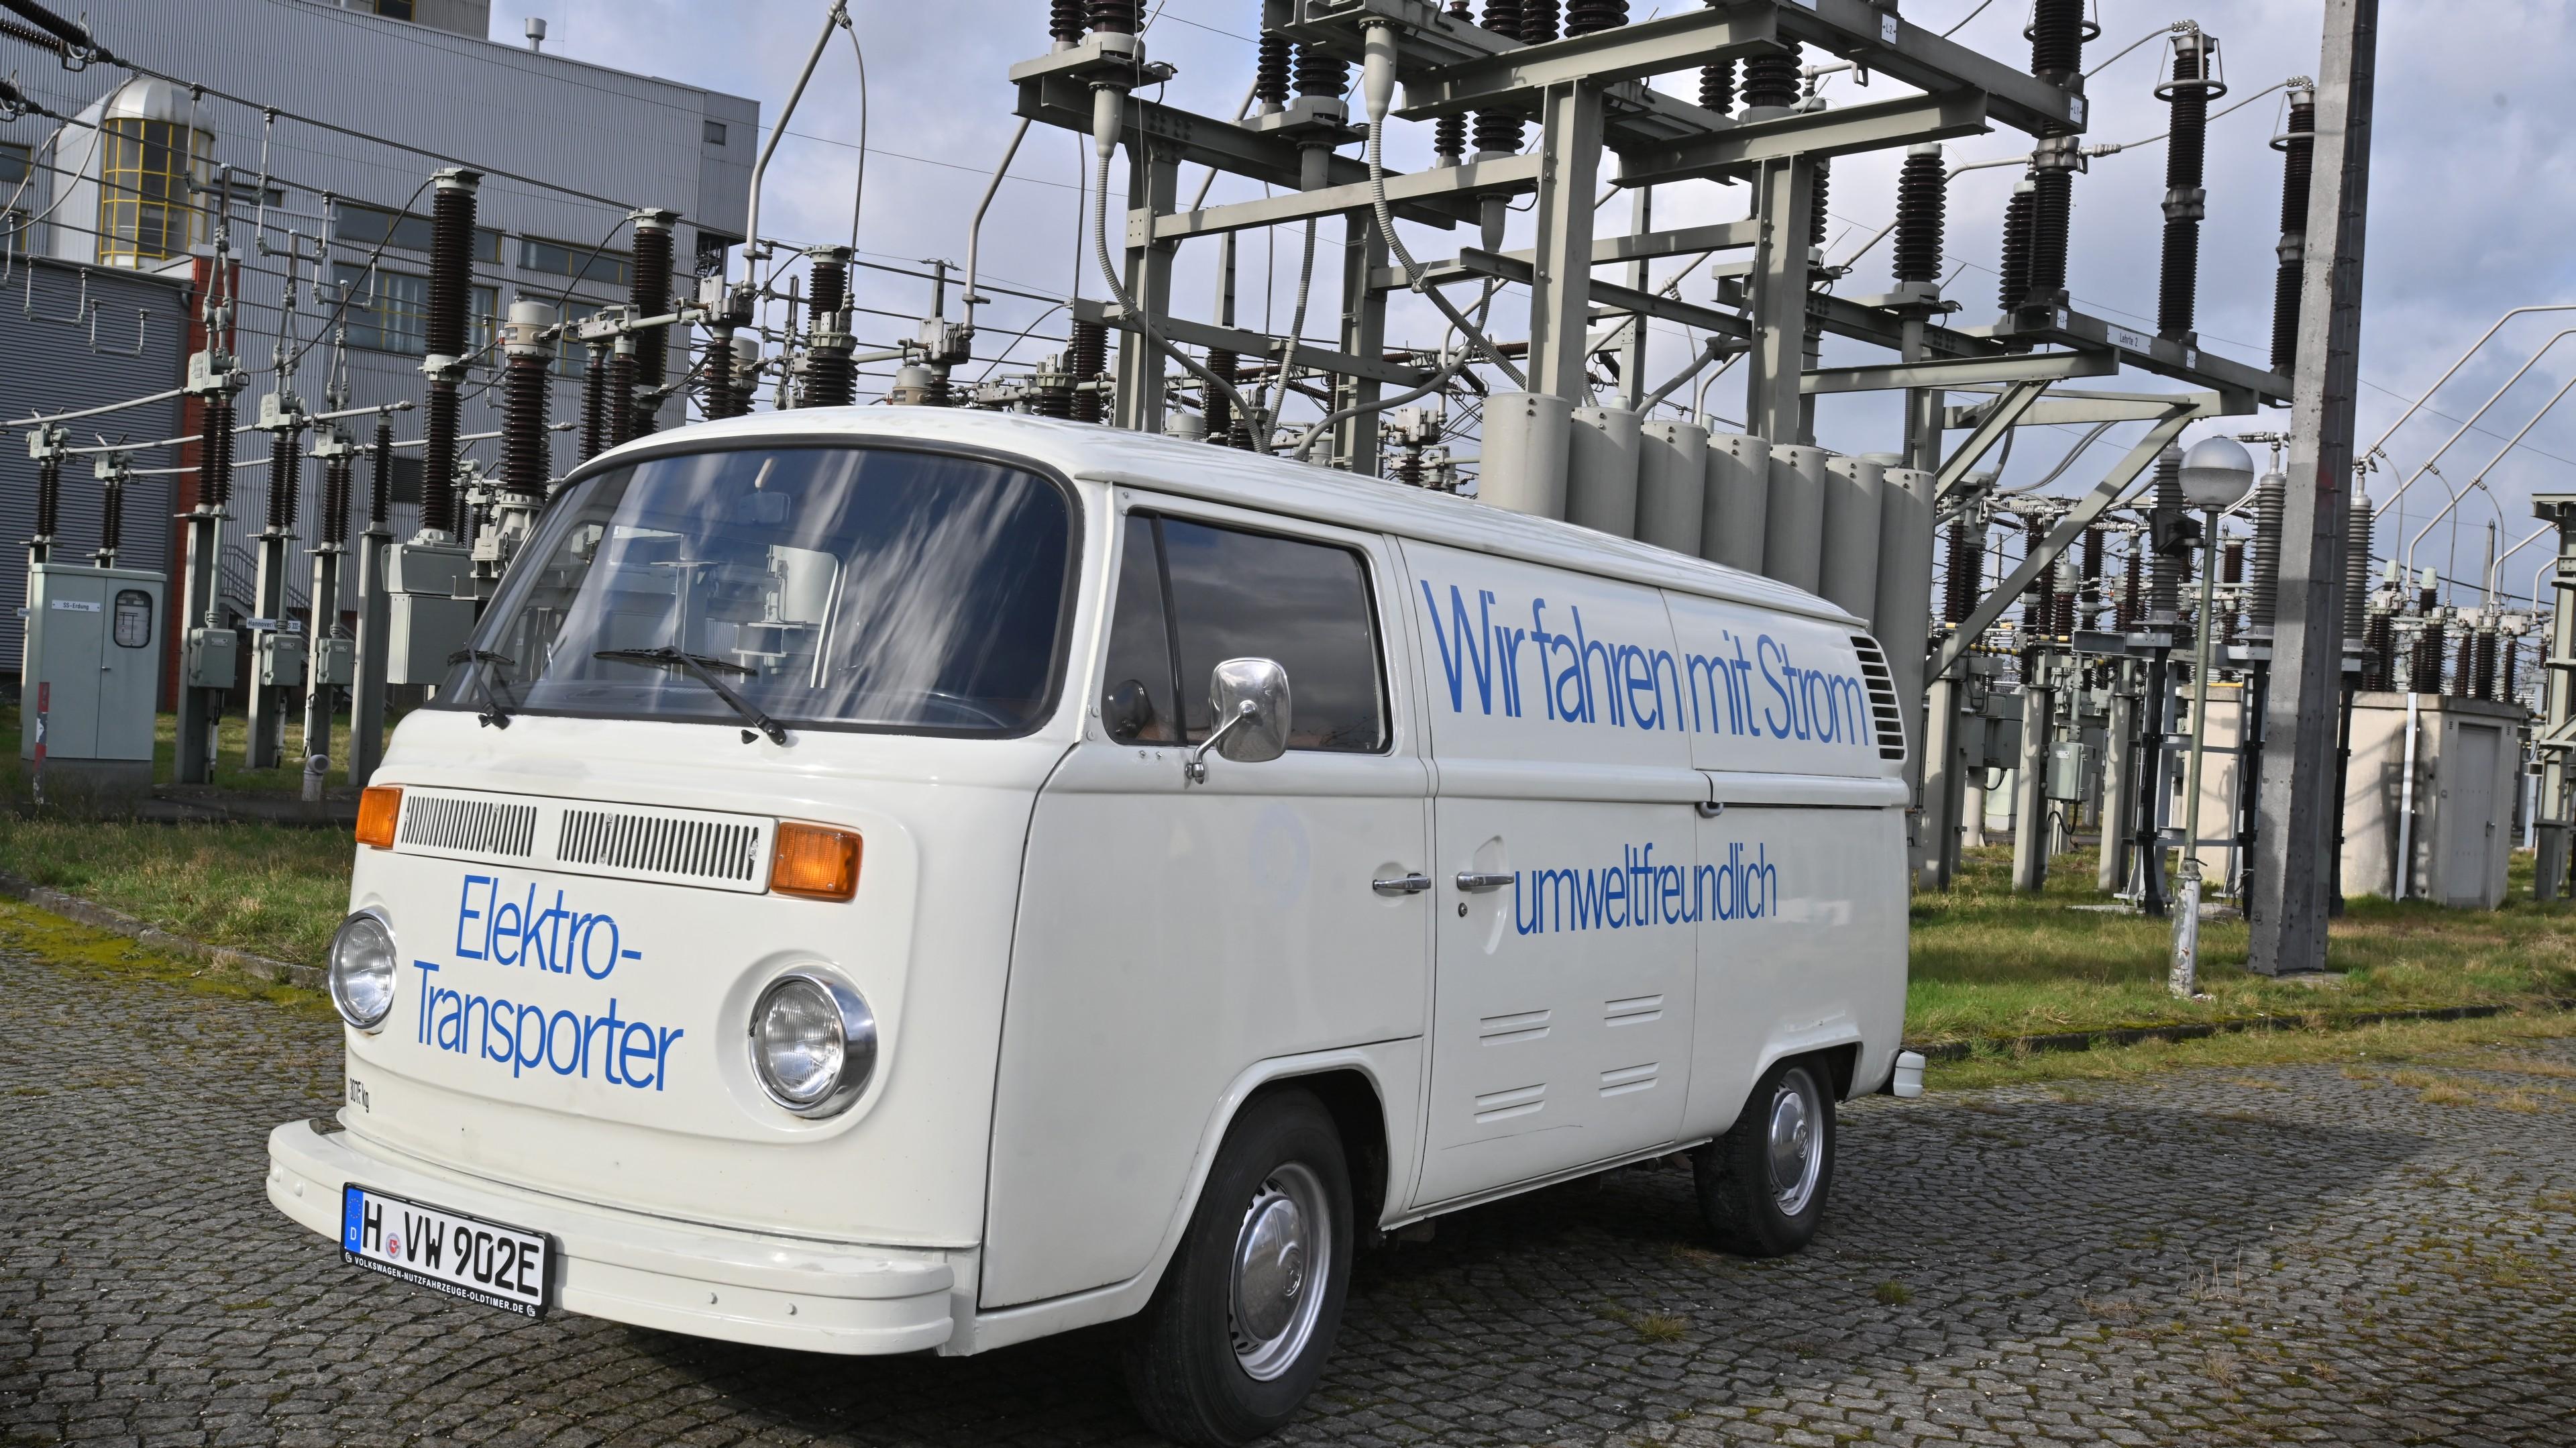 Volkswagen Elektro-Transporter na wystawie Techno Classica